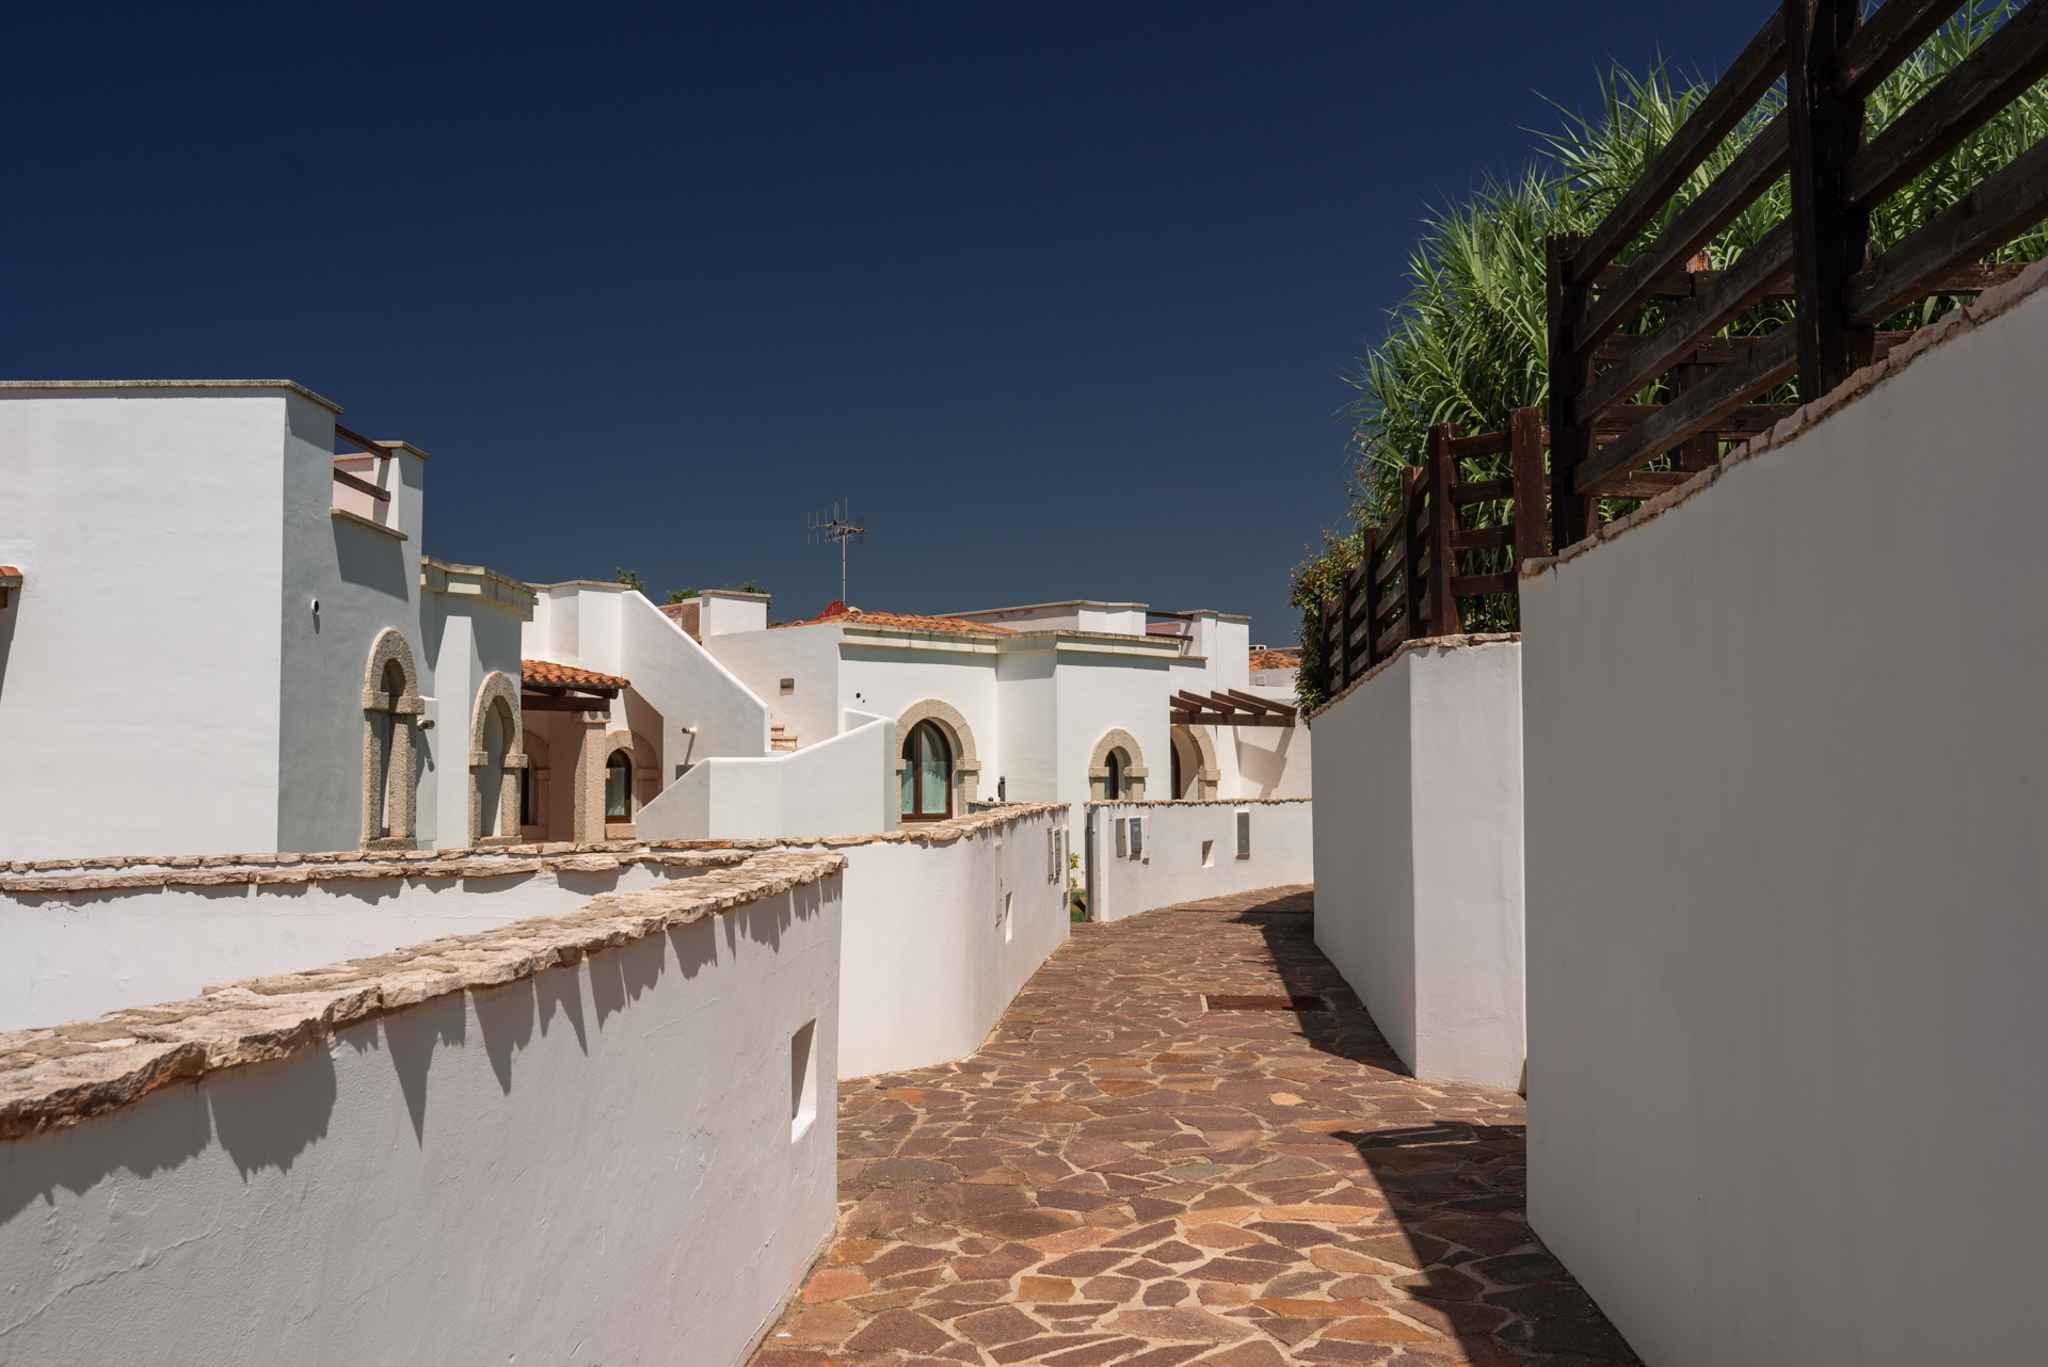 Ferienhaus con giardino (2182422), Alghero, Sassari, Sardinien, Italien, Bild 6